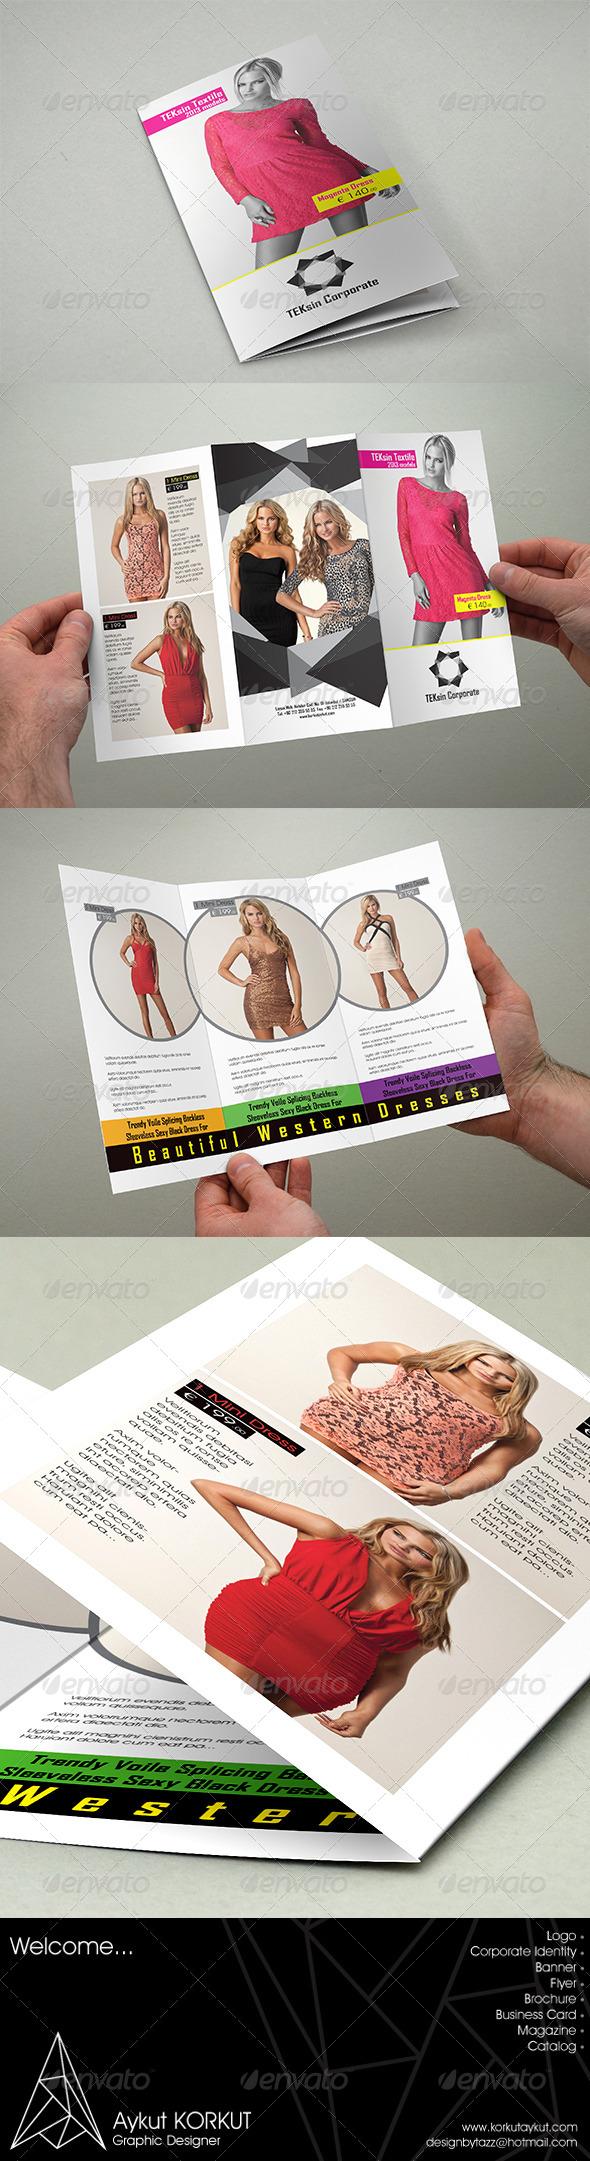 Teksin Corporate Brochure Template - Brochures Print Templates